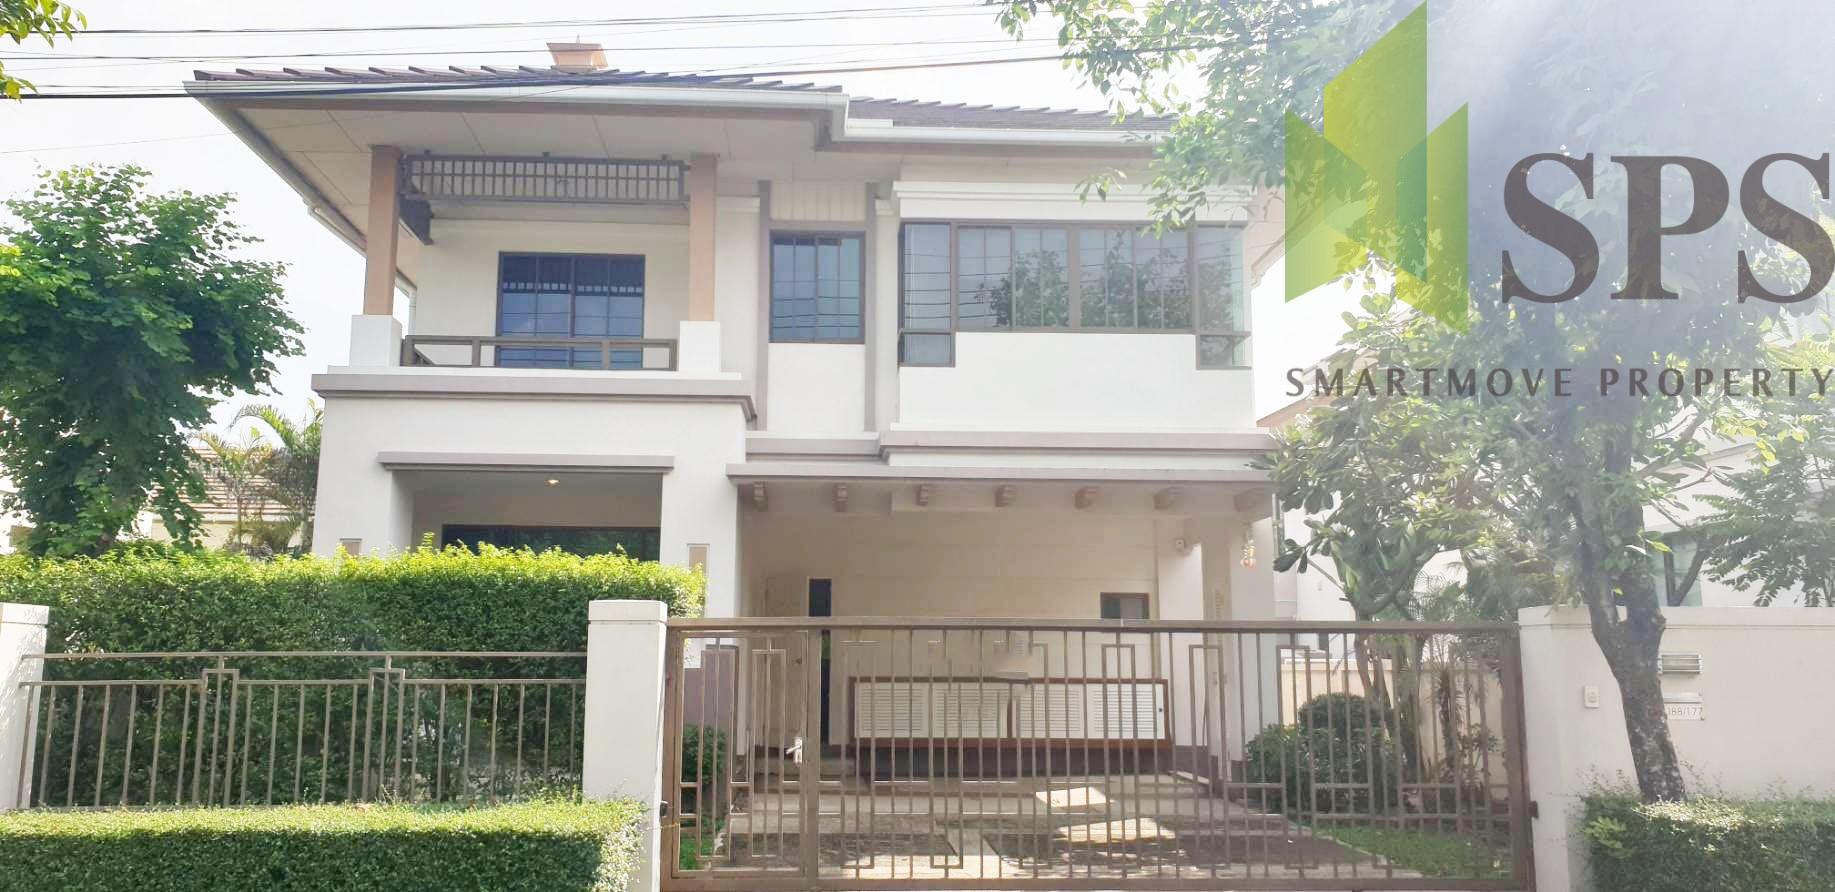 Single House Setthasiri Bangna บ้านเดี่ยวให้เช่าโครงการเศรษฐสิริบางนา ( SPSPE278)